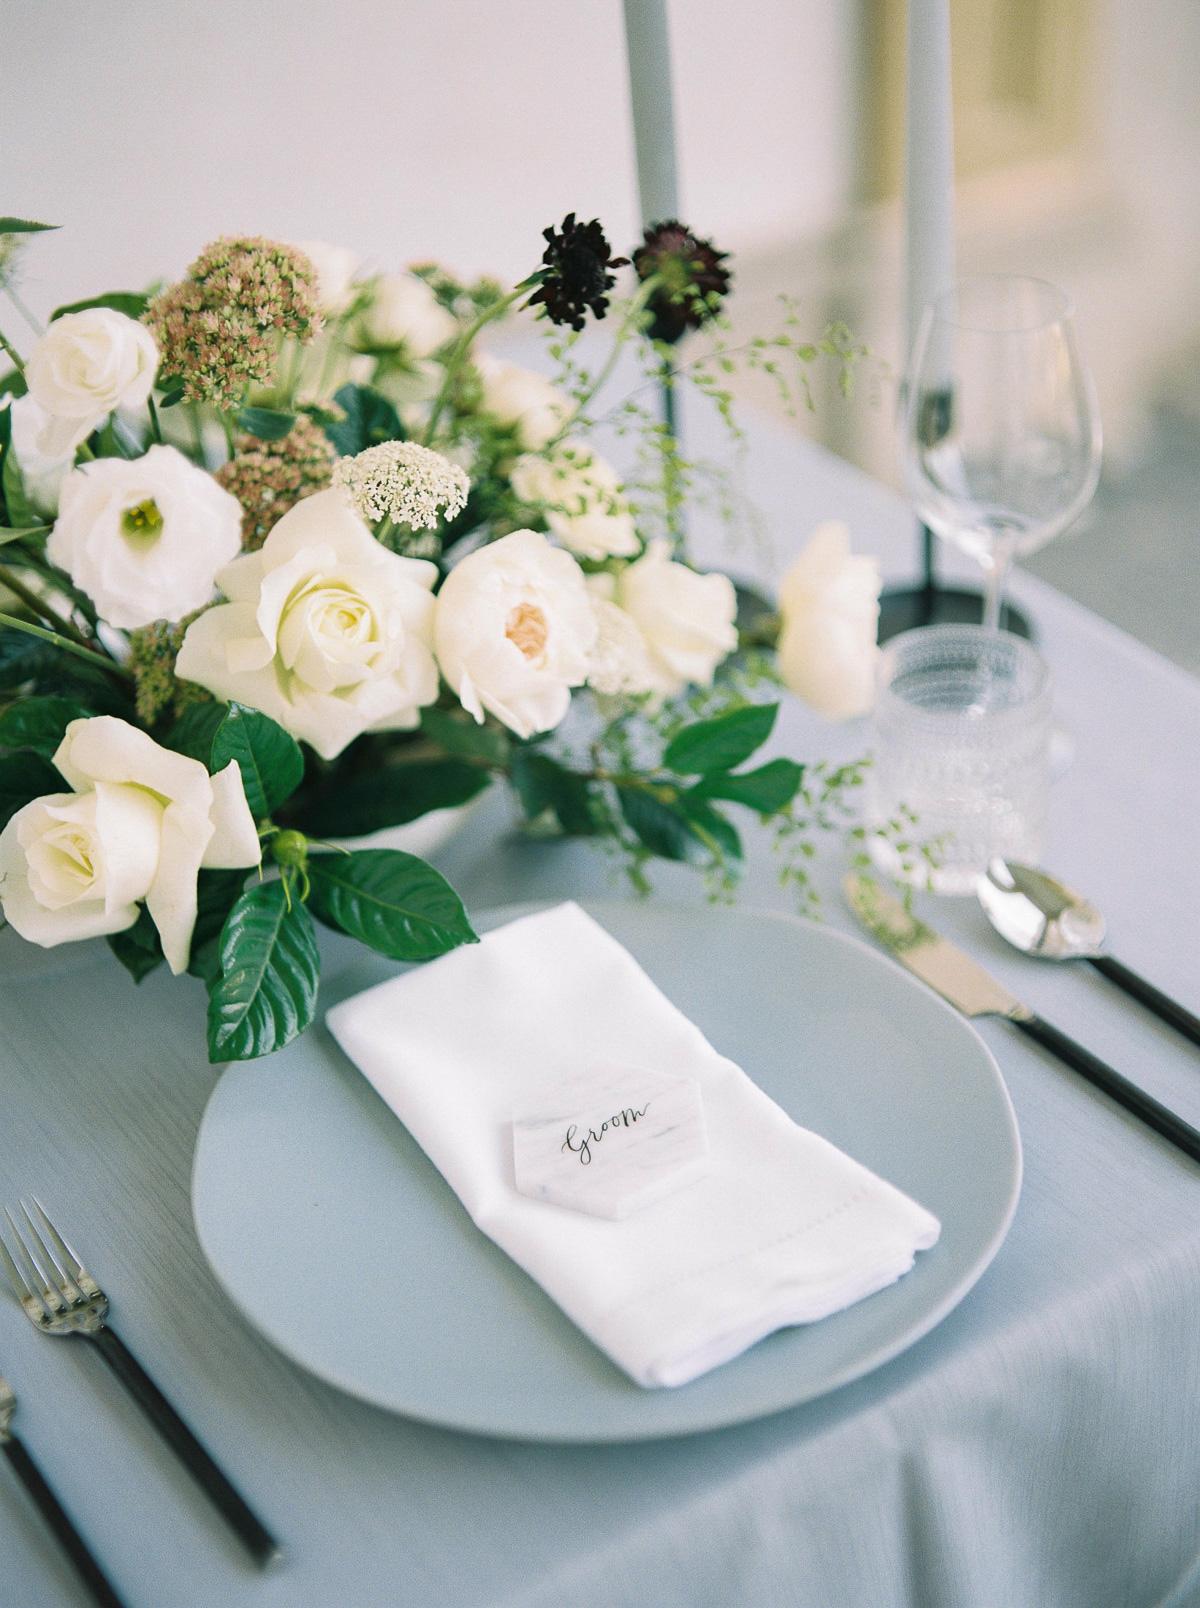 kurtz-orpia-photography-vineyard-bride-swish-list-dundurn-castle-dundas-wedding-editorial-36.jpg